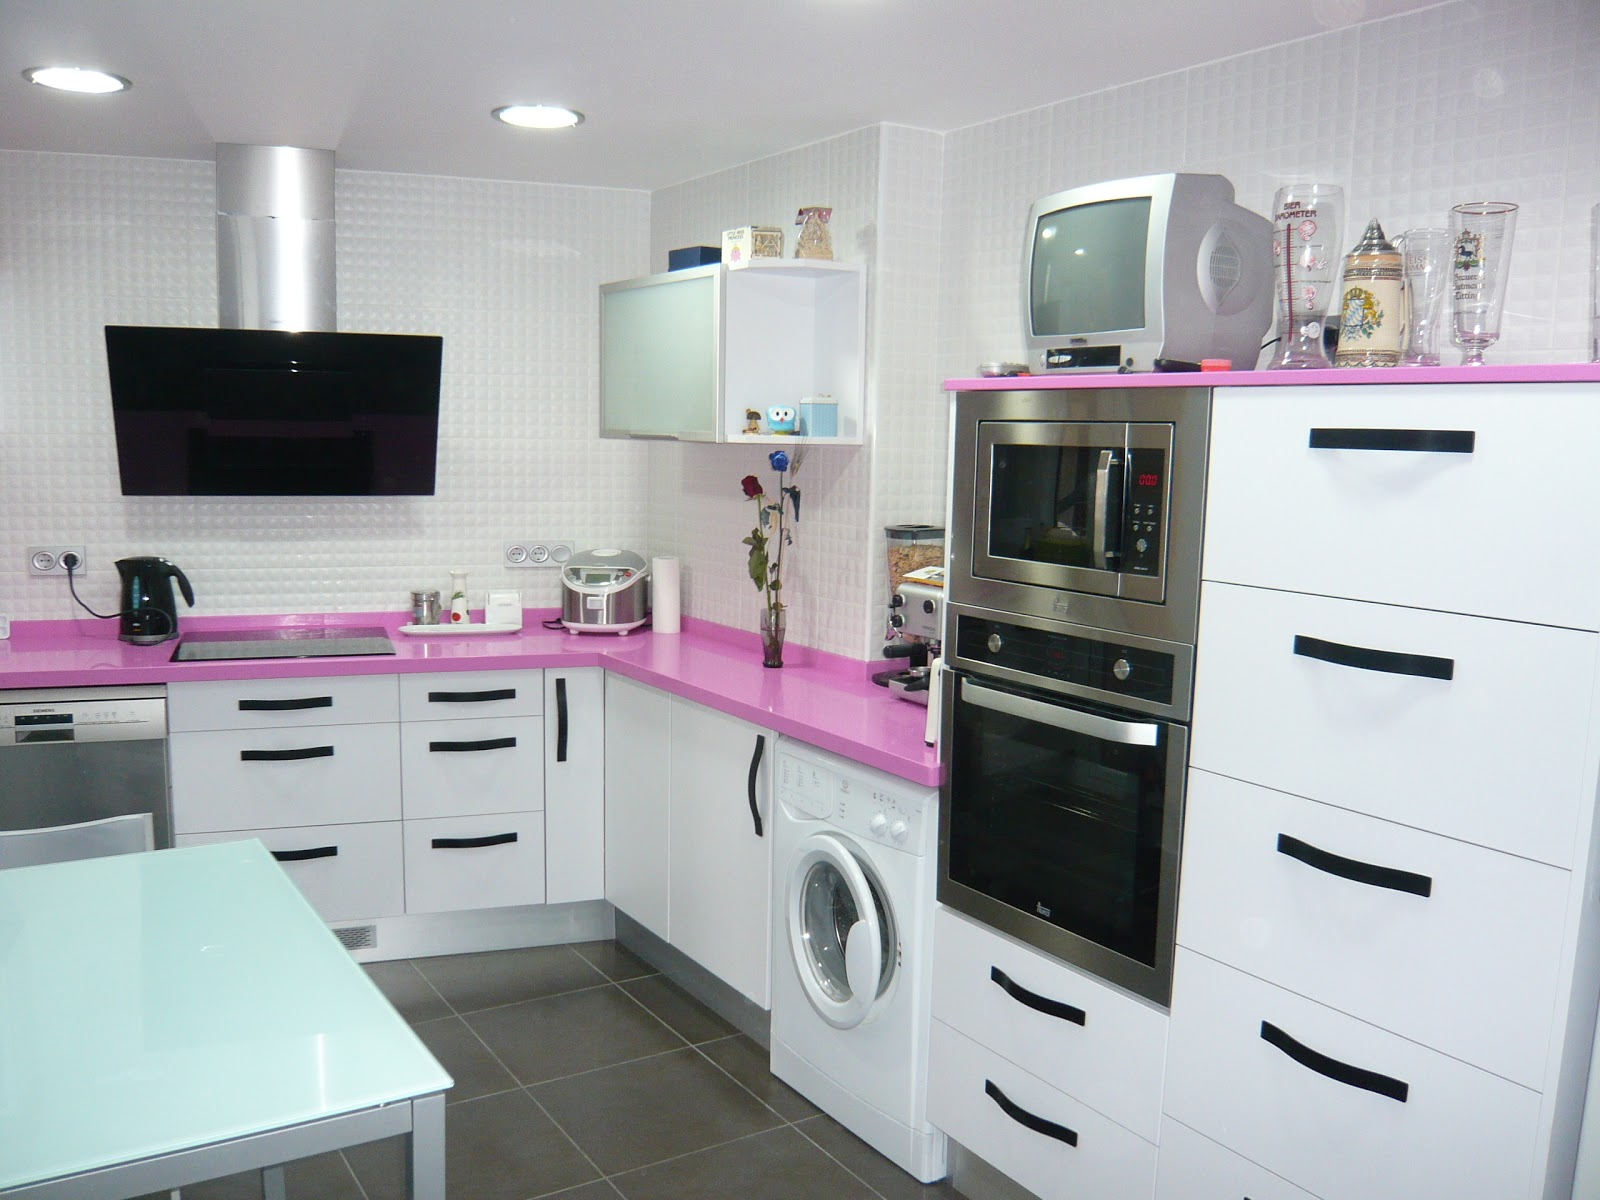 Reuscuina muebles de cocina en formica blanca mate for Muebles de formica para cocina